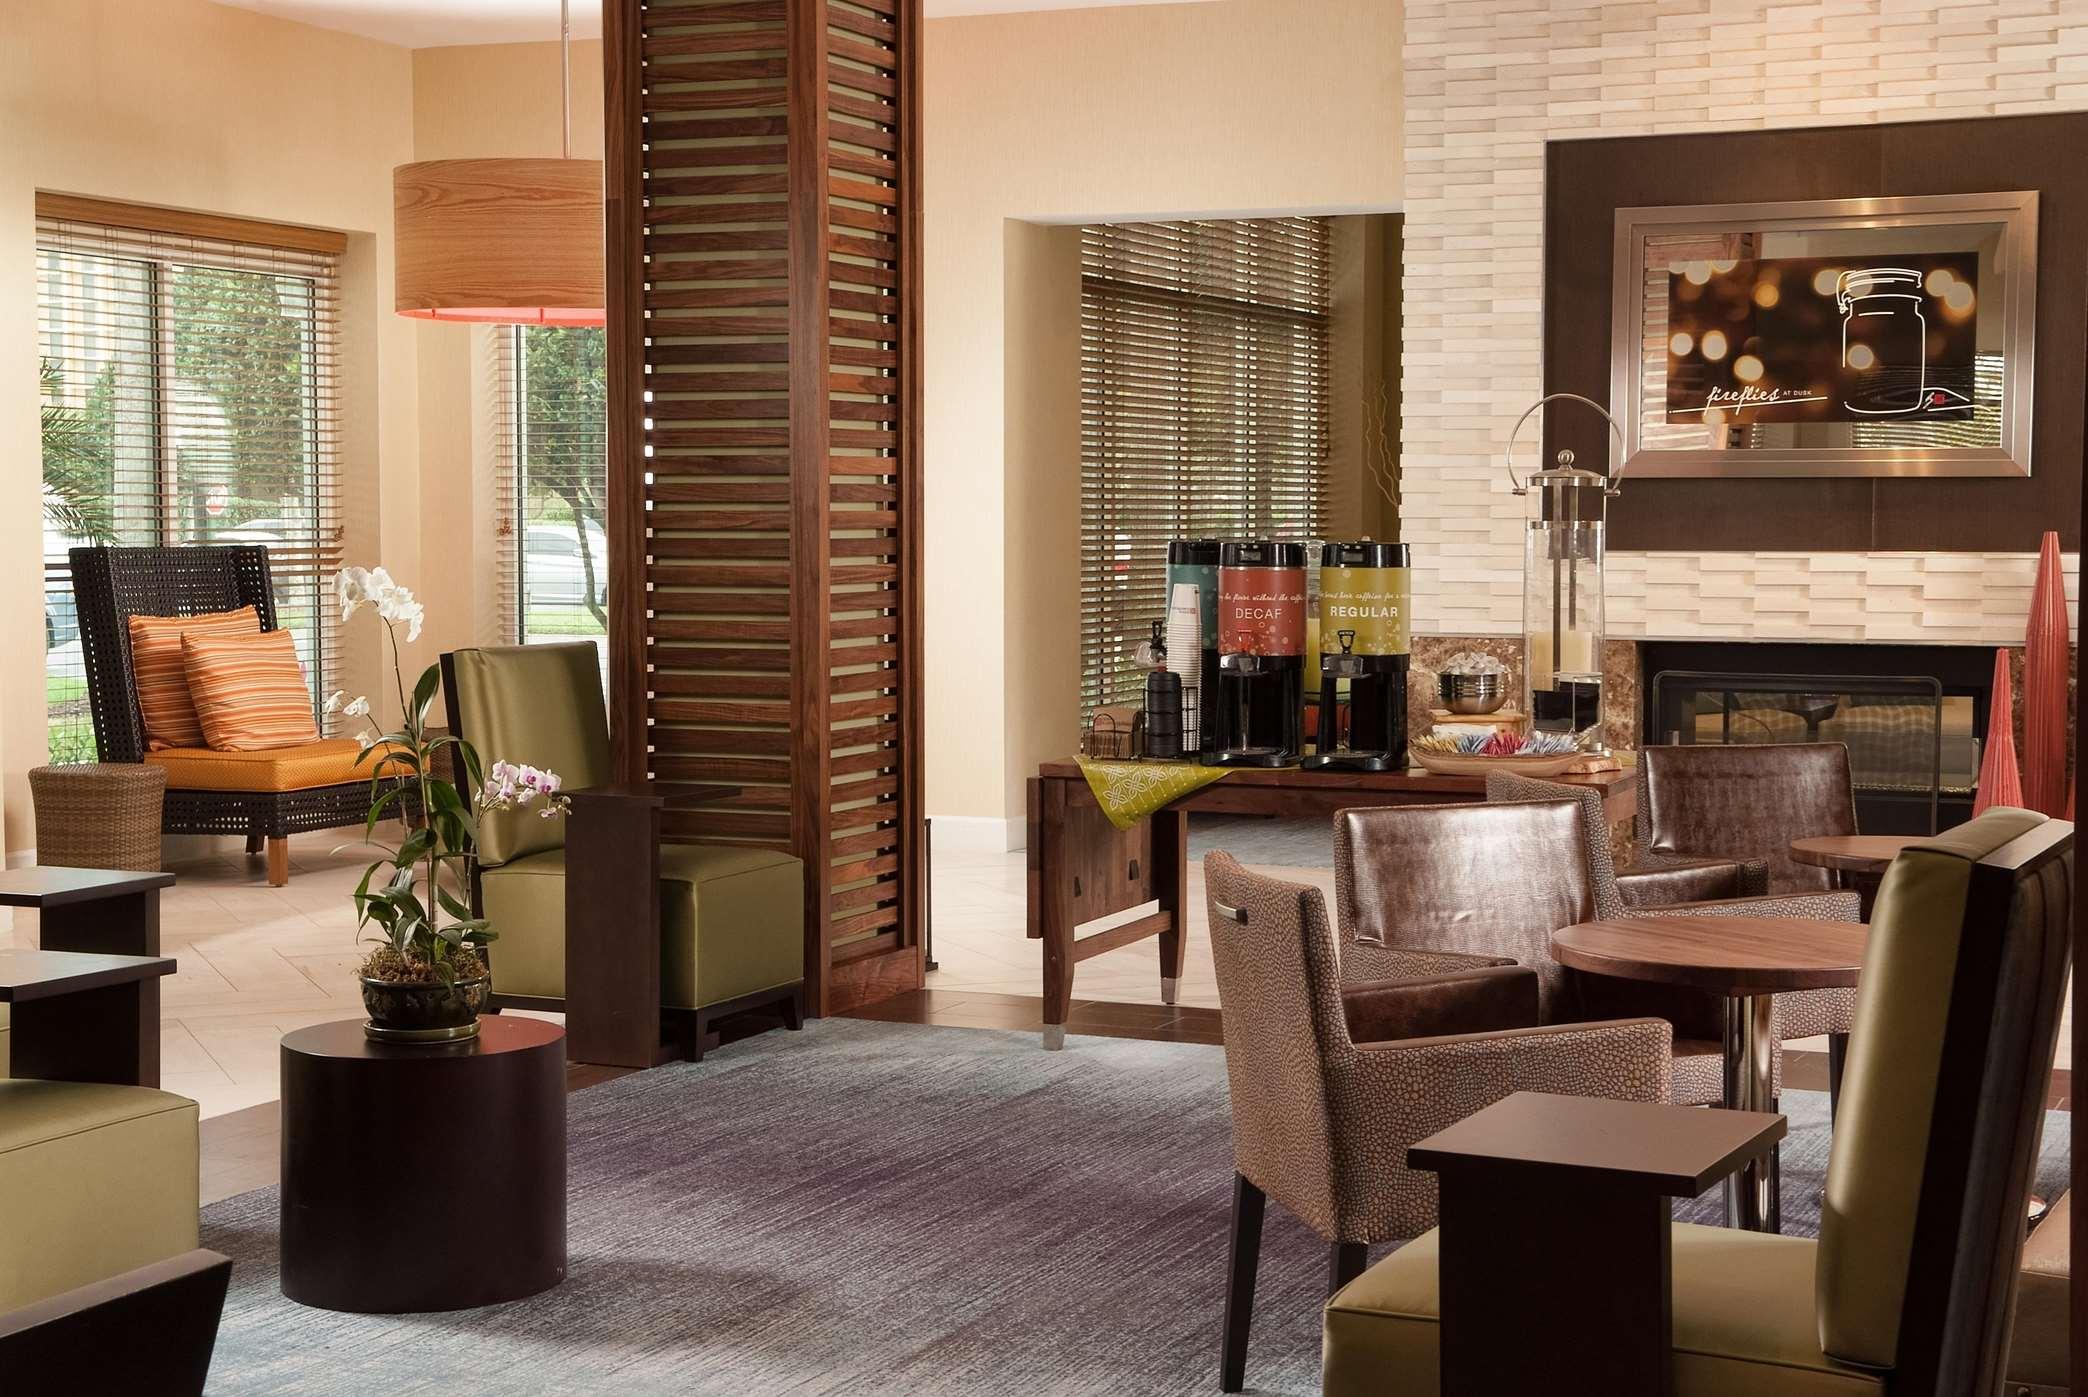 Hilton Garden Inn Orlando Airport 7300 Augusta National Drive ...